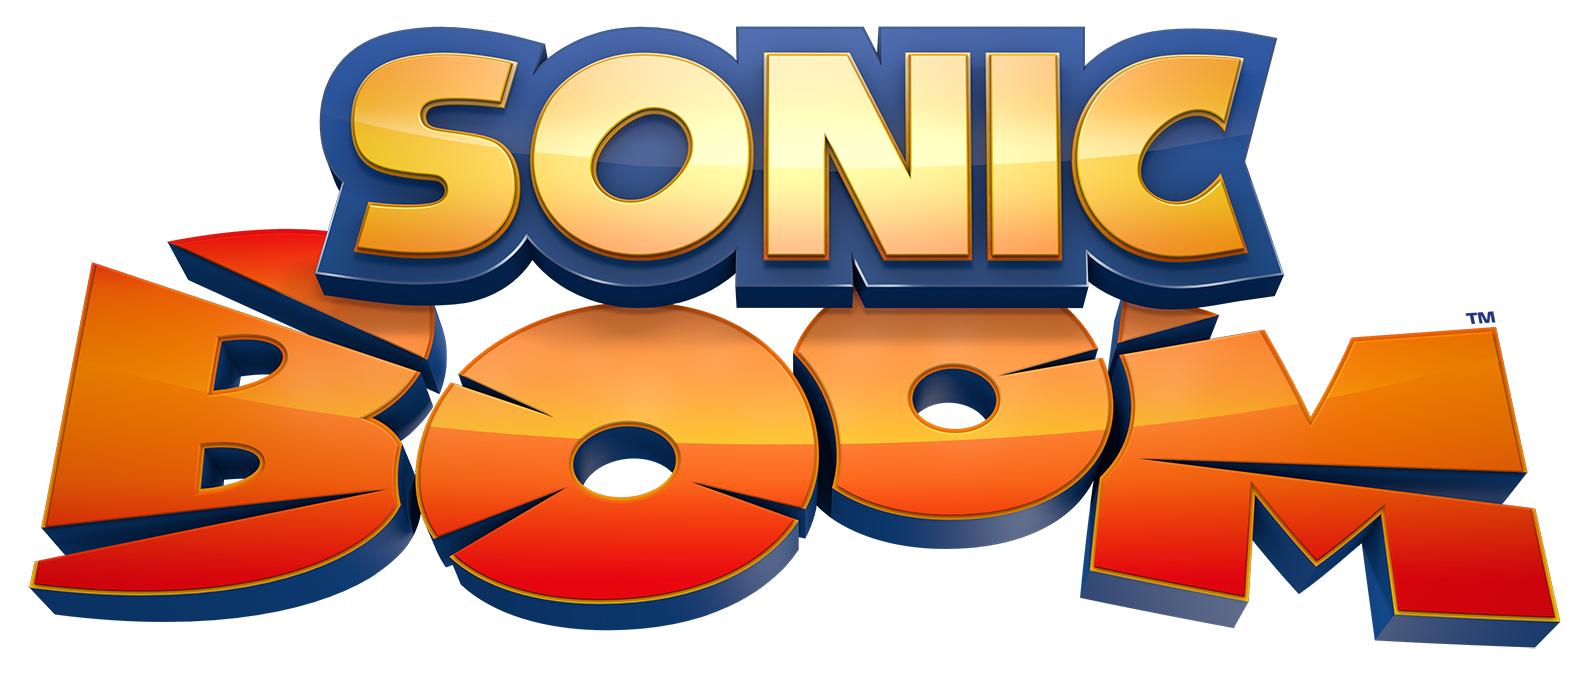 Sonic_Boom_Tv_logo.png